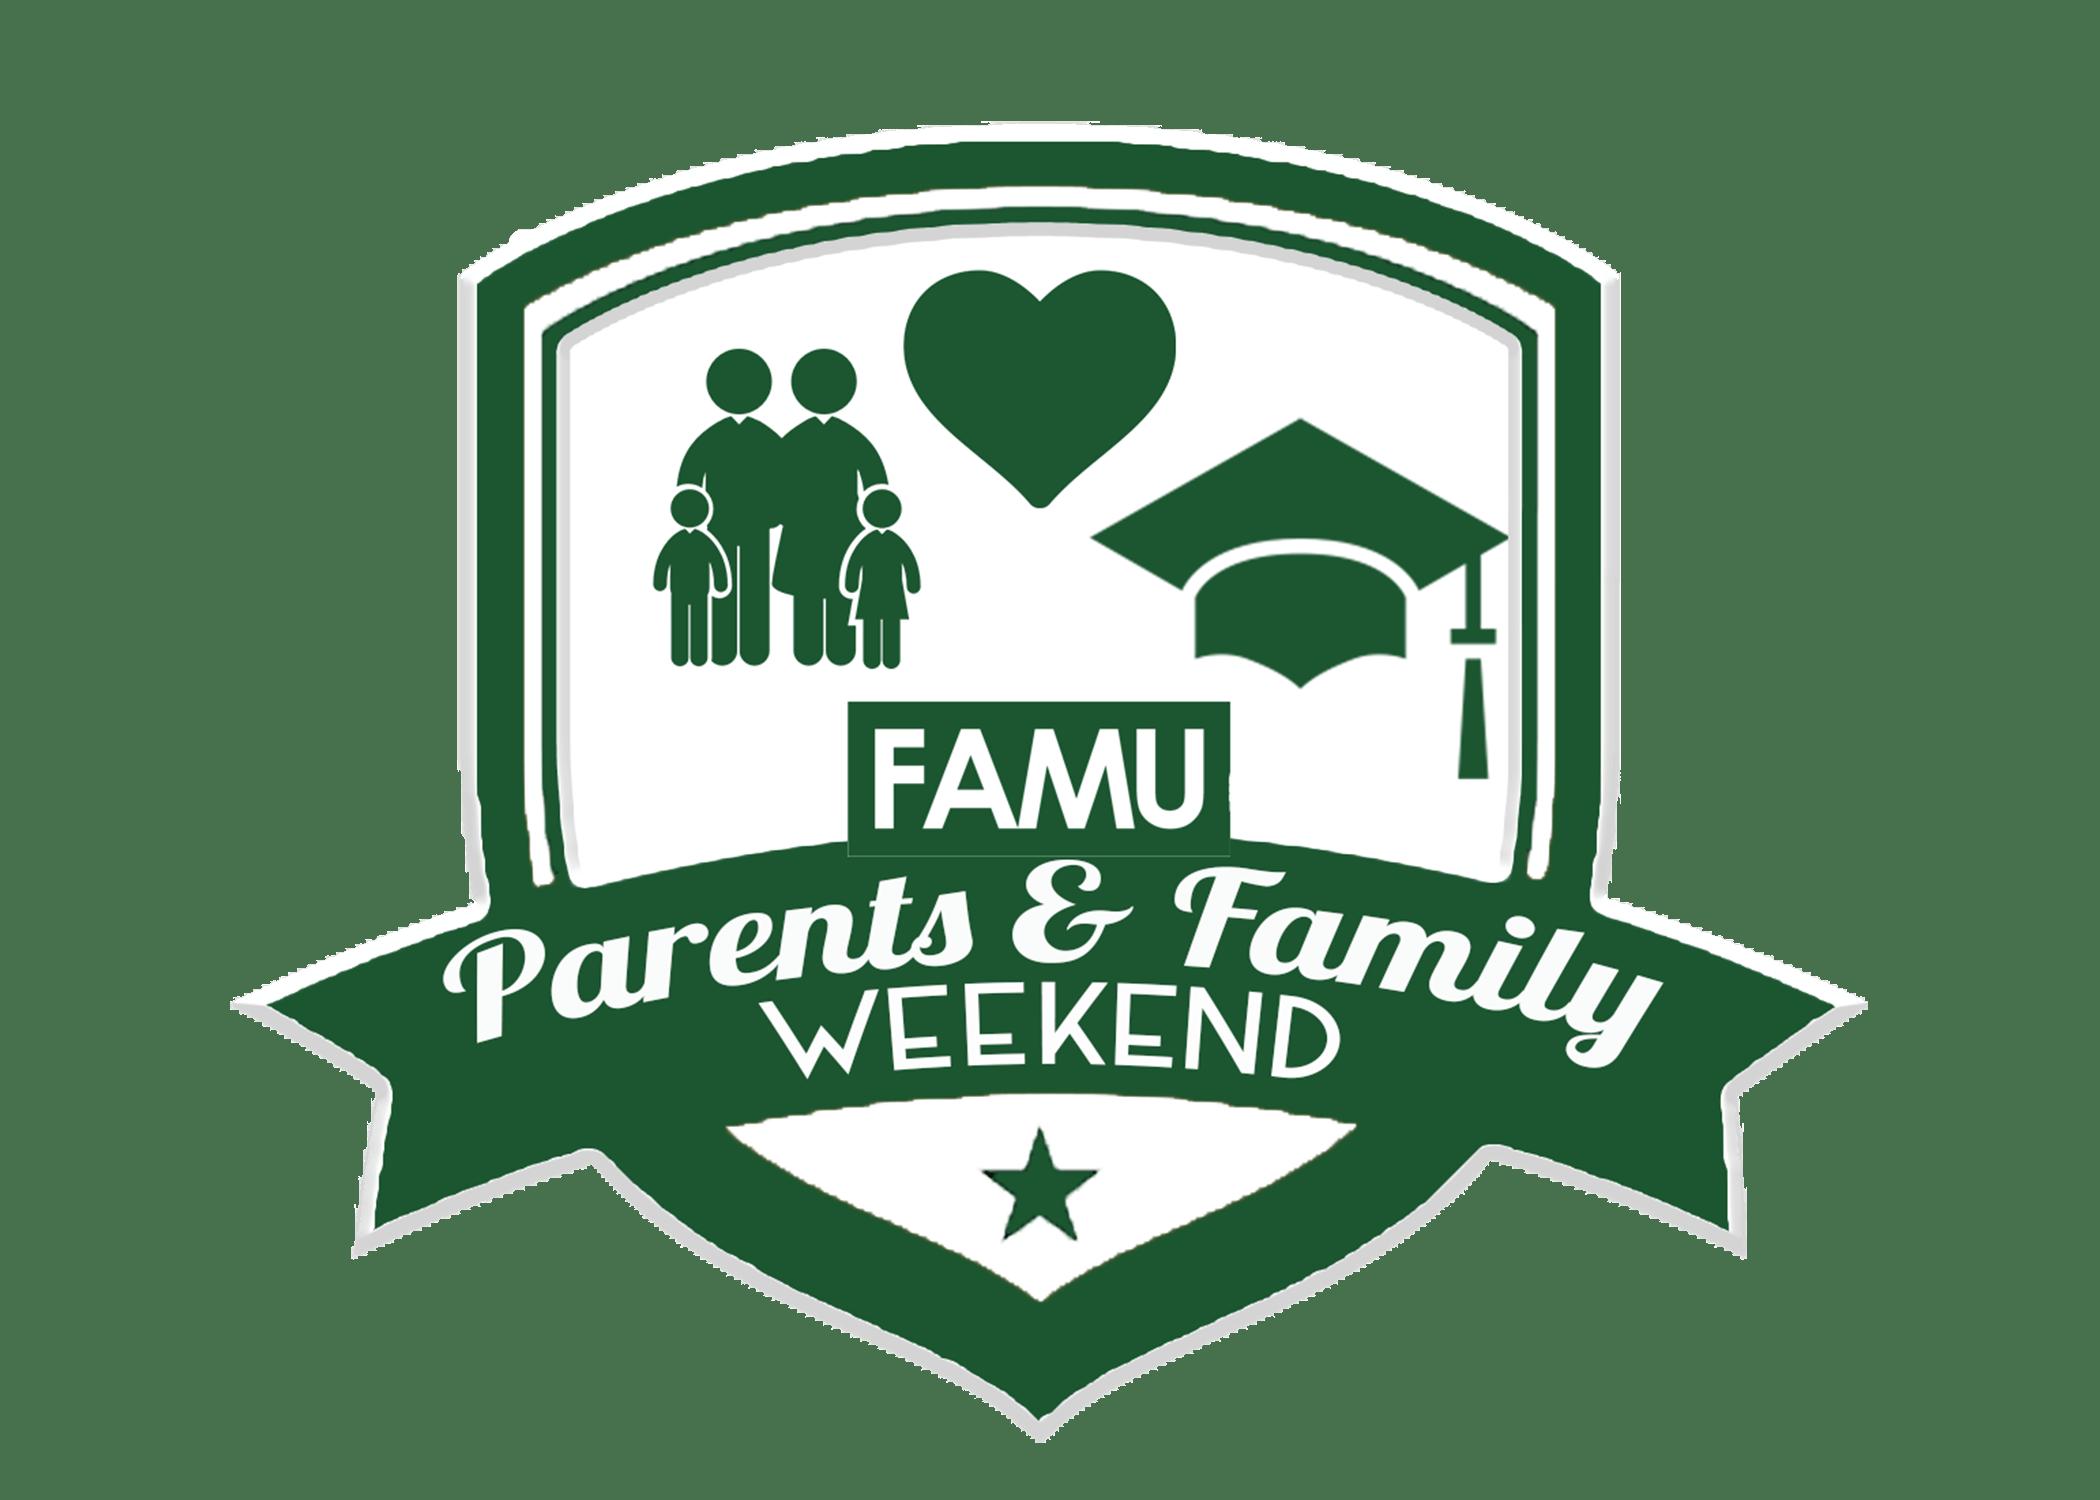 FAMU Parents & Family Weekend 2018